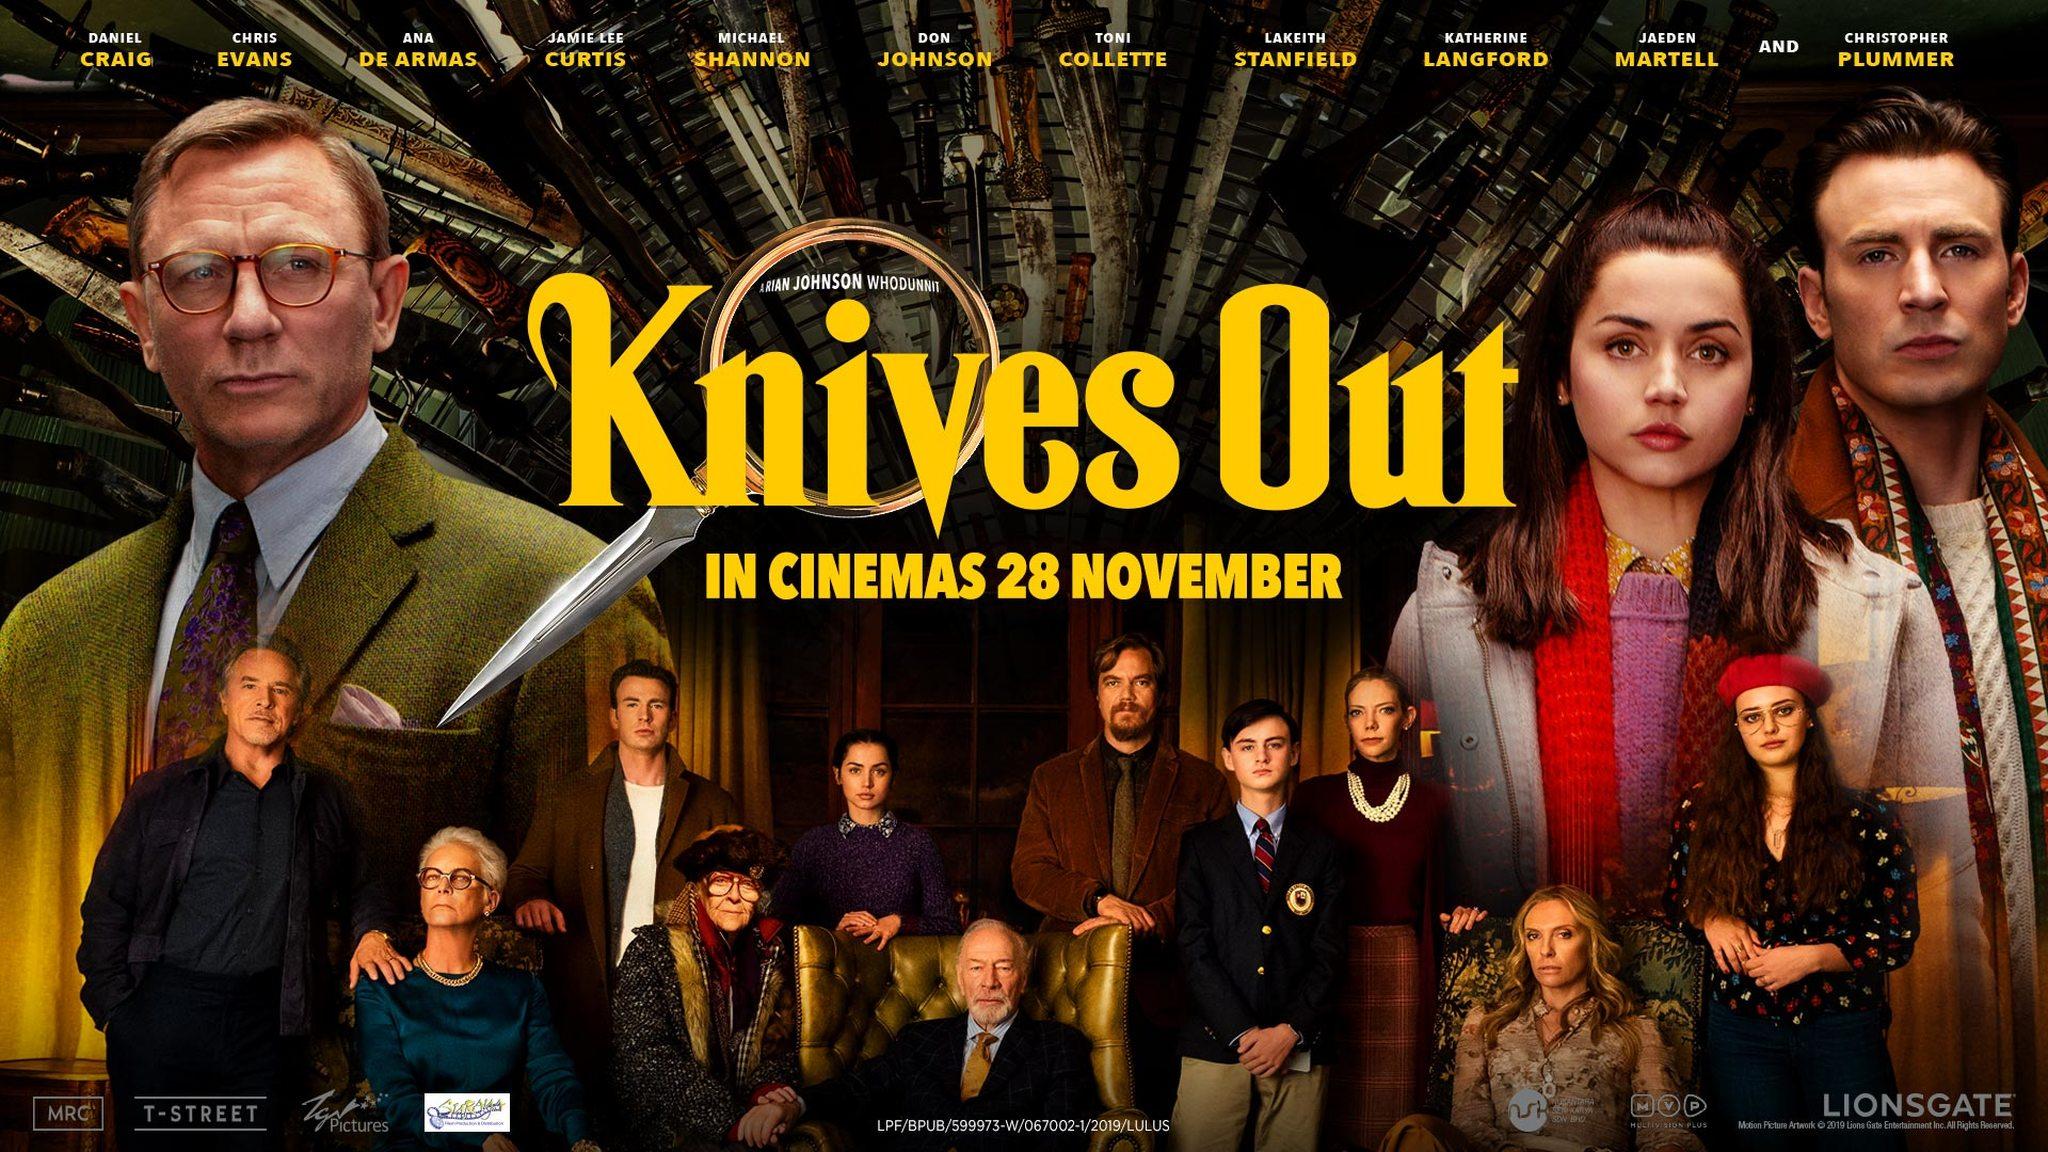 Se confirma secuela de 'Knives Out' - The Couch